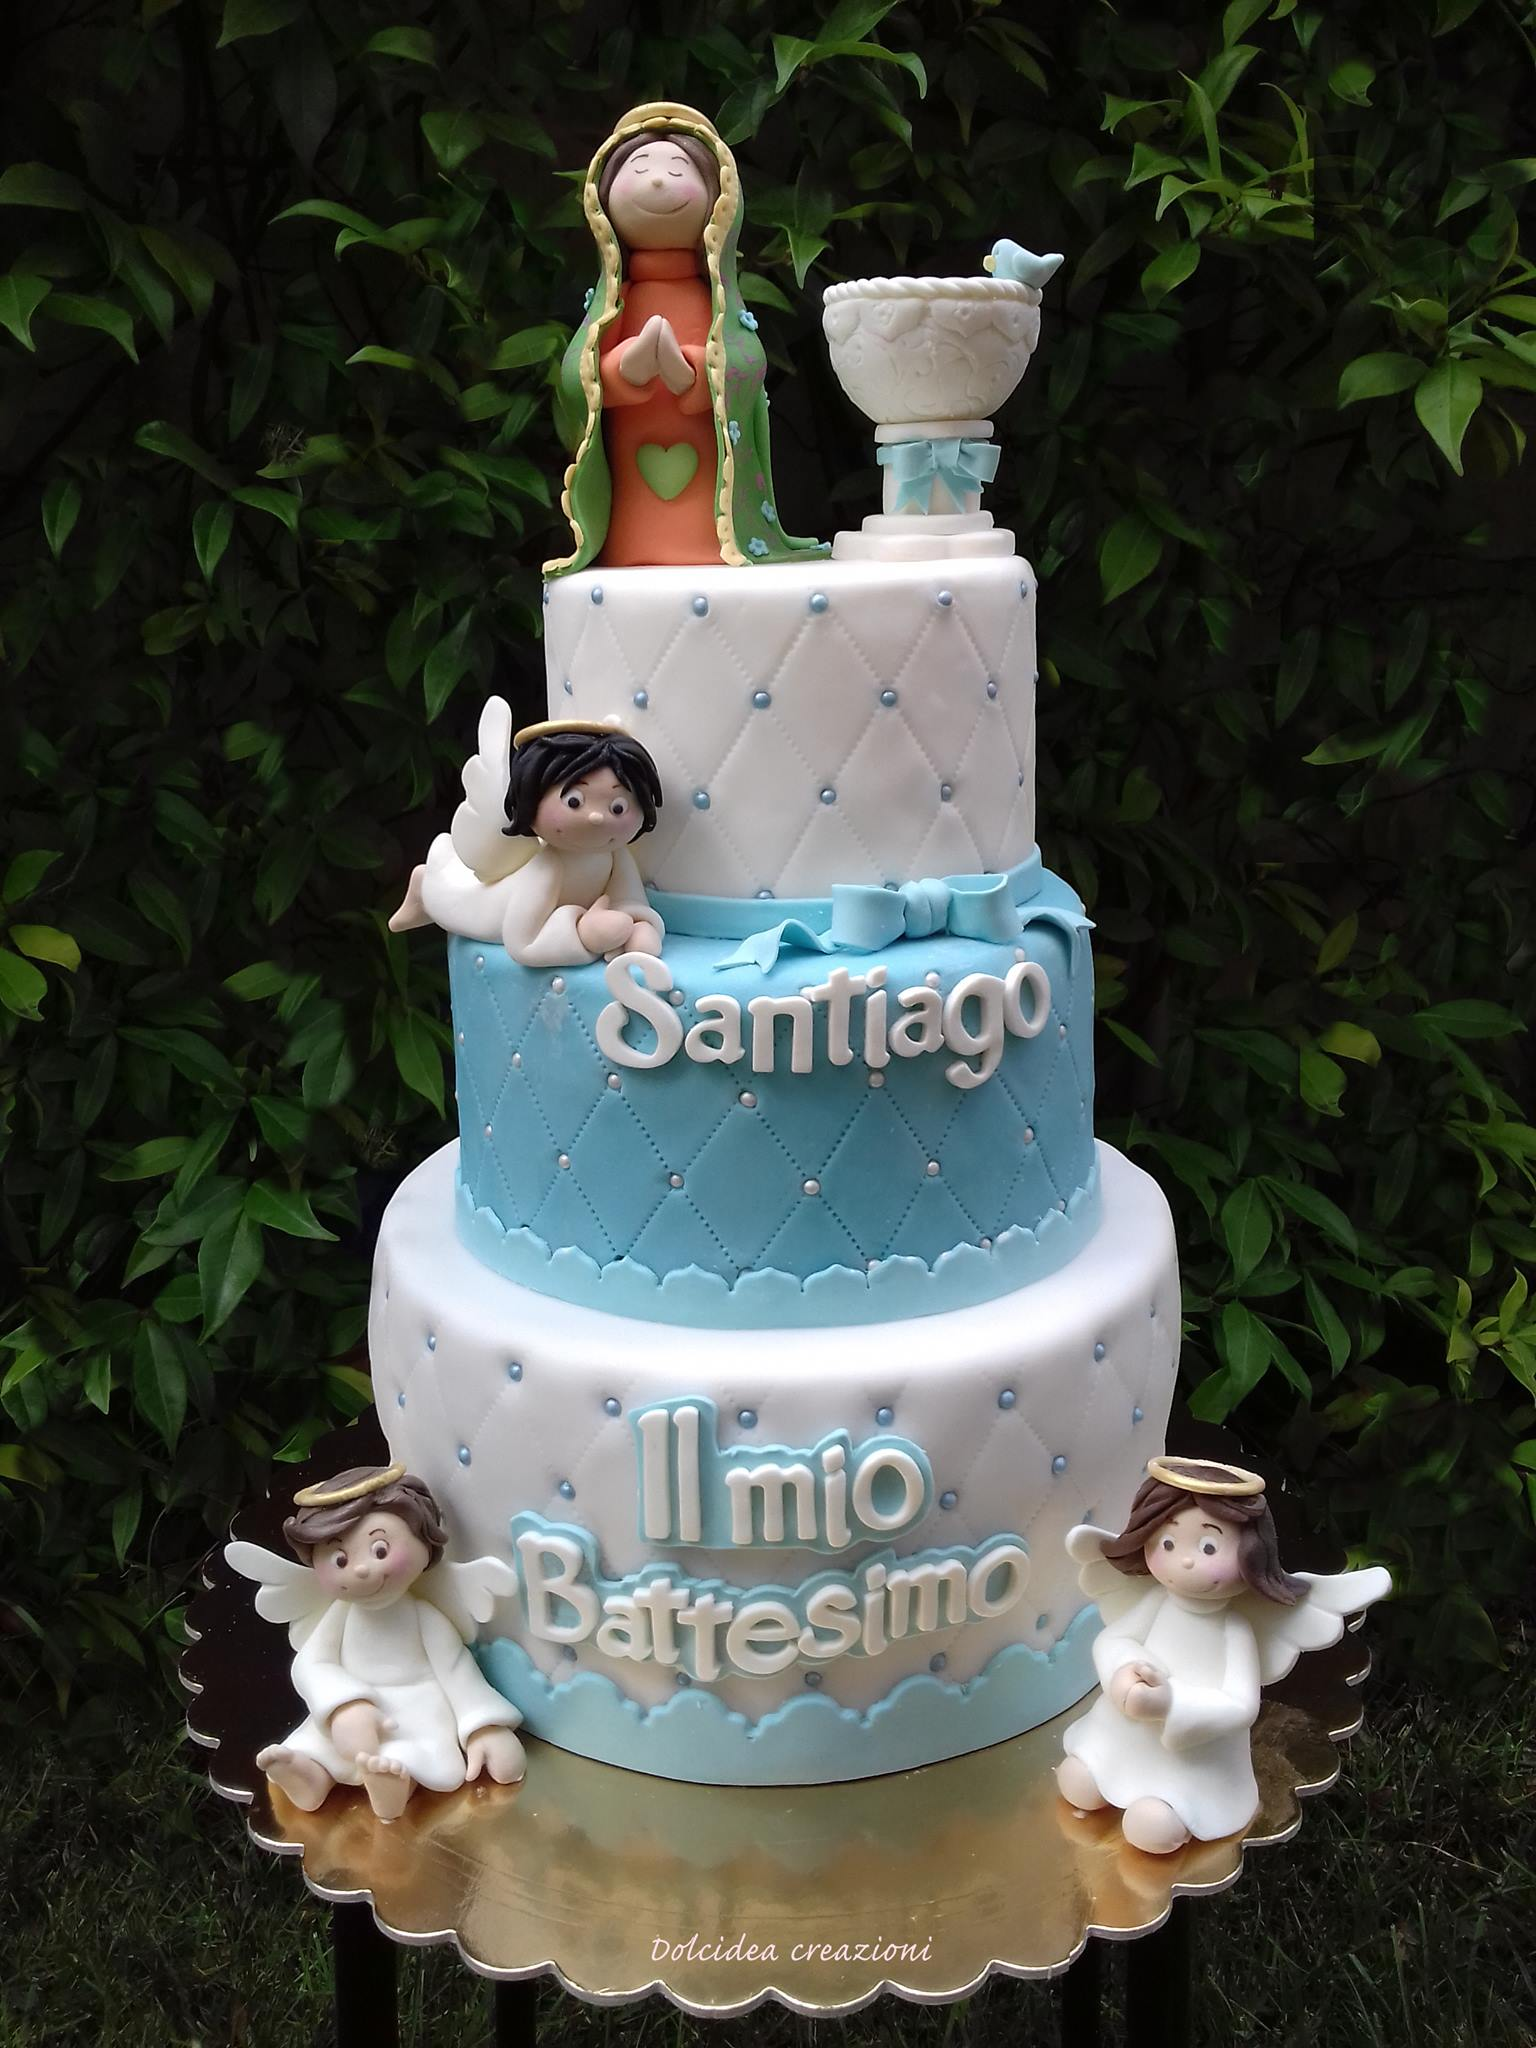 Ben noto Torta battesimo: idee di torte di cake design per maschio e femmina NC84